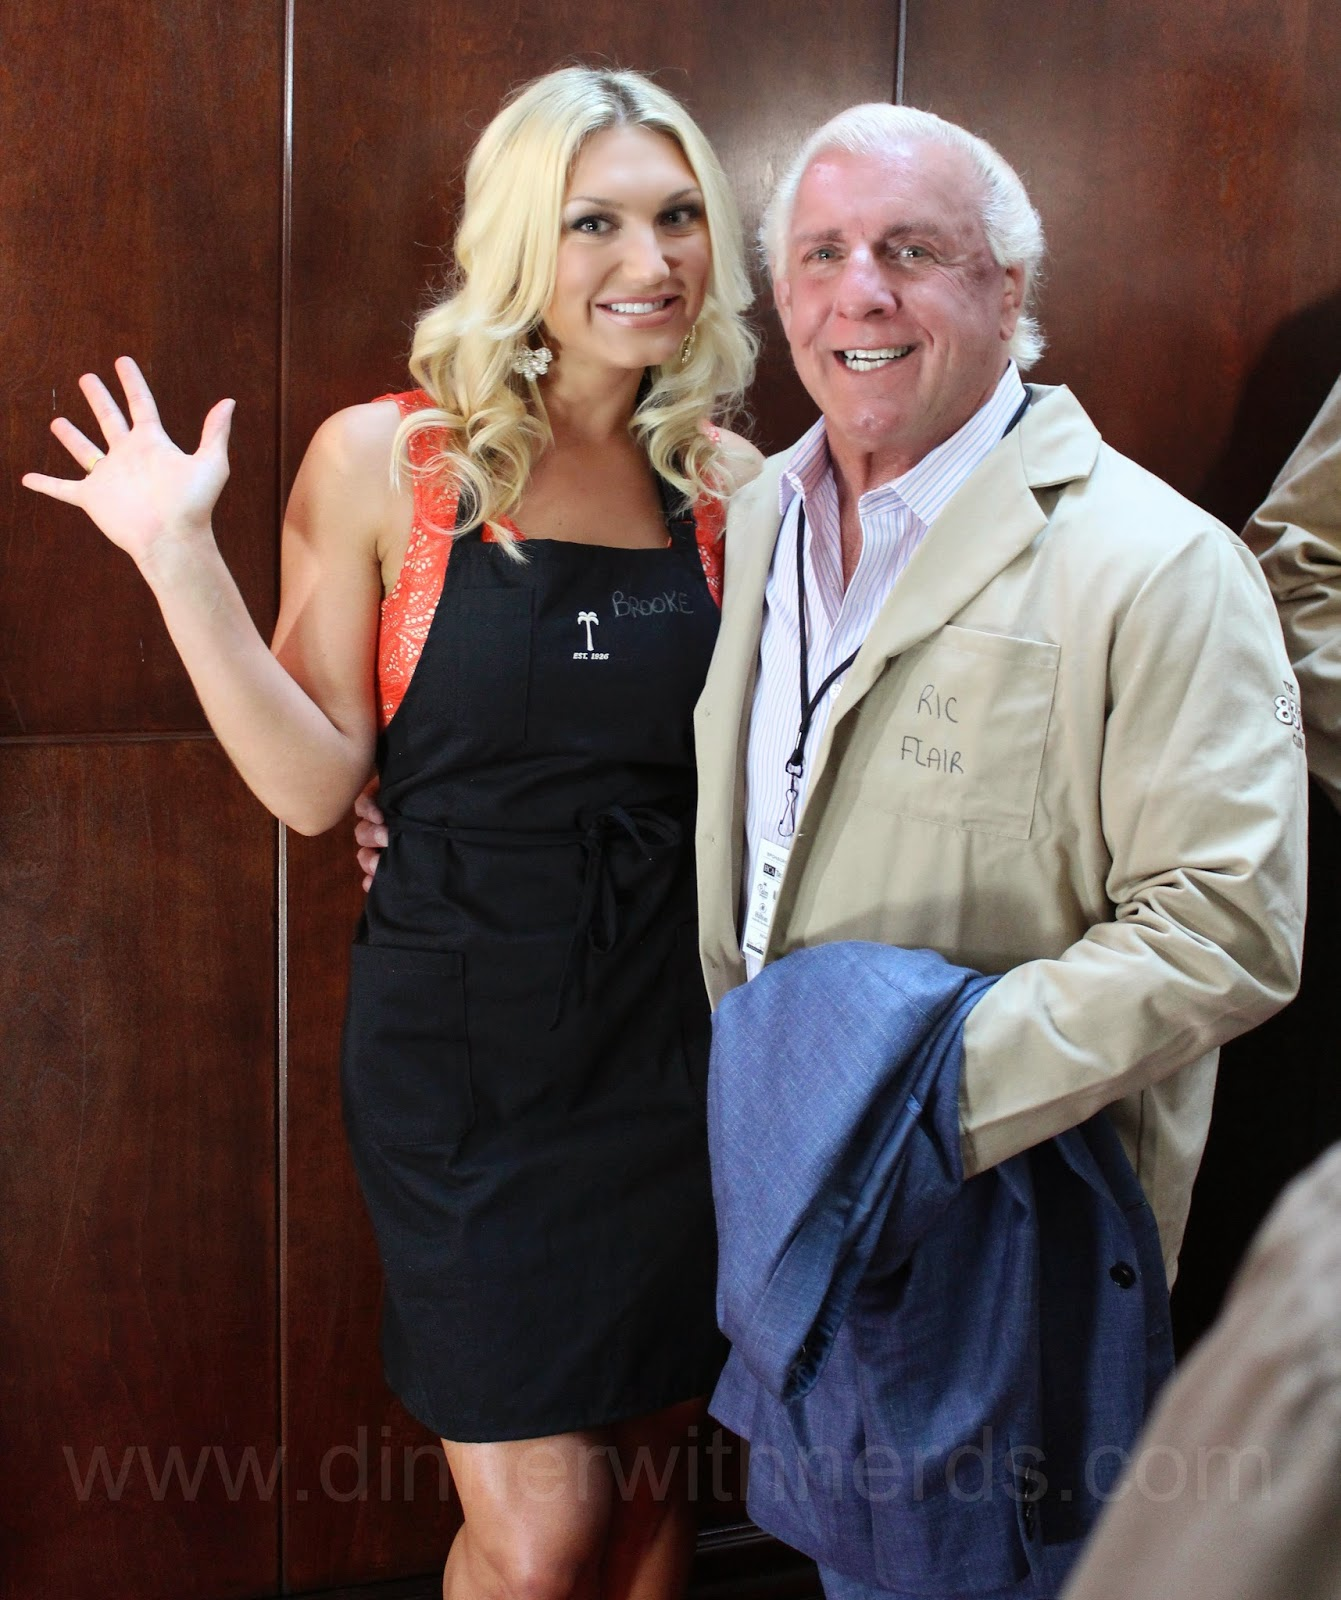 Brooke Hogan Rick Flair